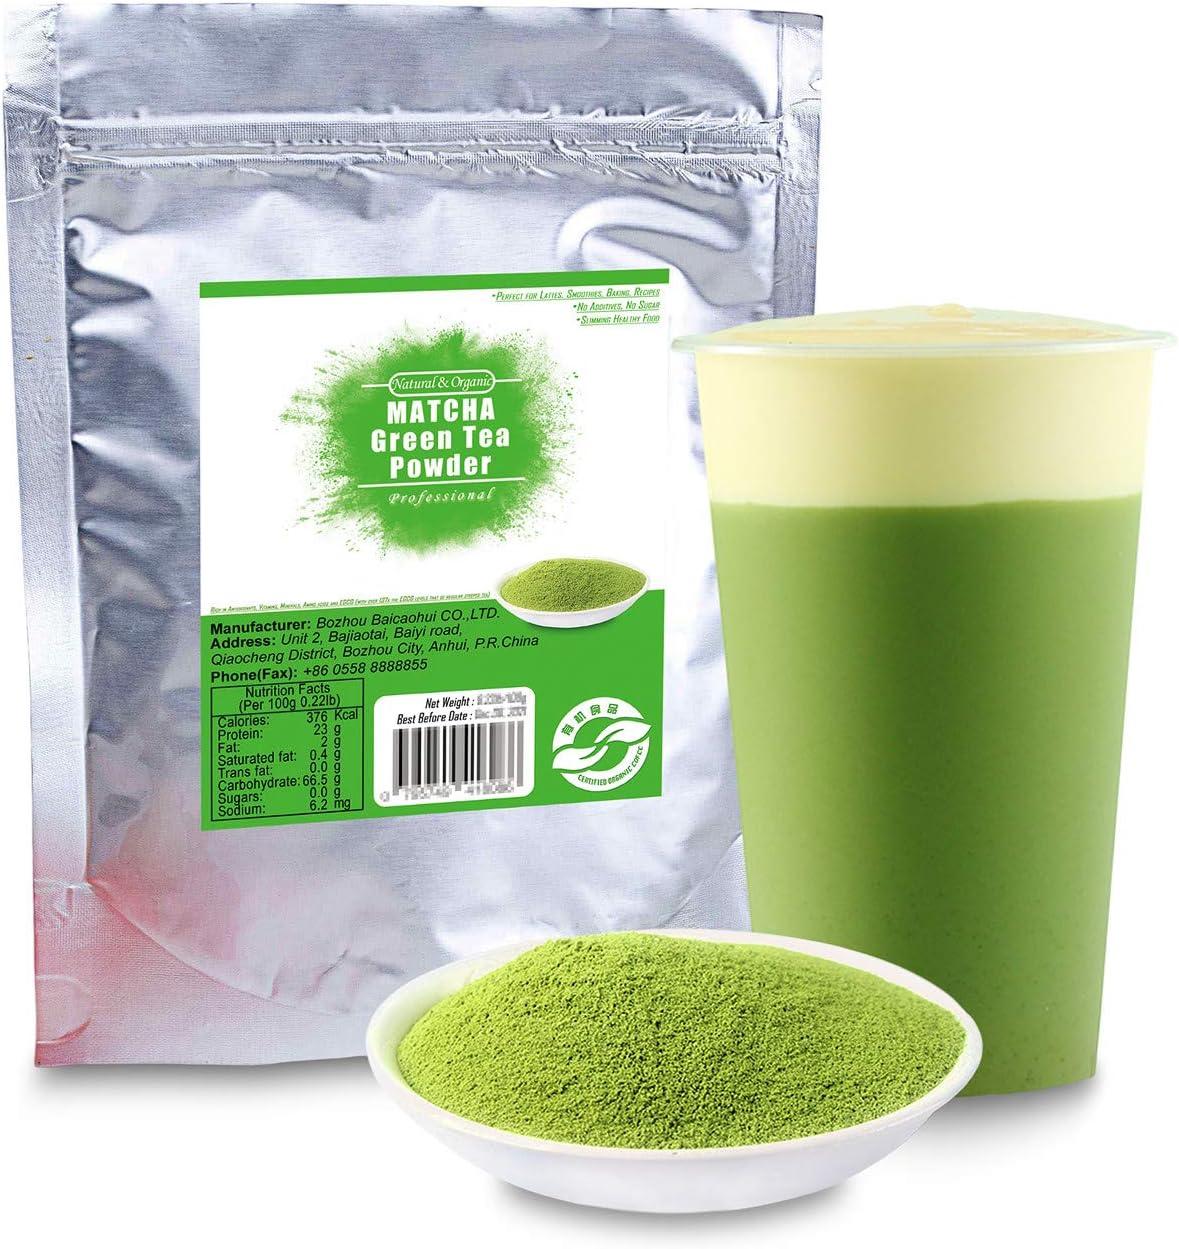 XJhoma 40% OFF Cheap Sale China 100% Natural Organic Green Health Tea Matcha Powder Inventory cleanup selling sale